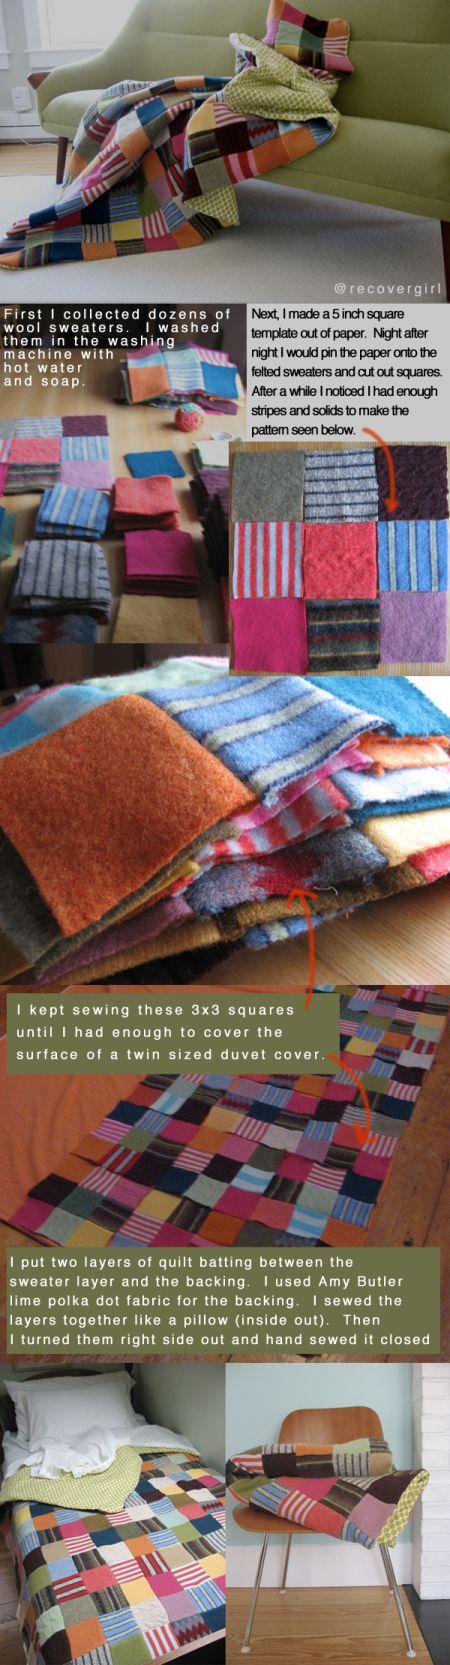 8. Felted Sweater Blanket